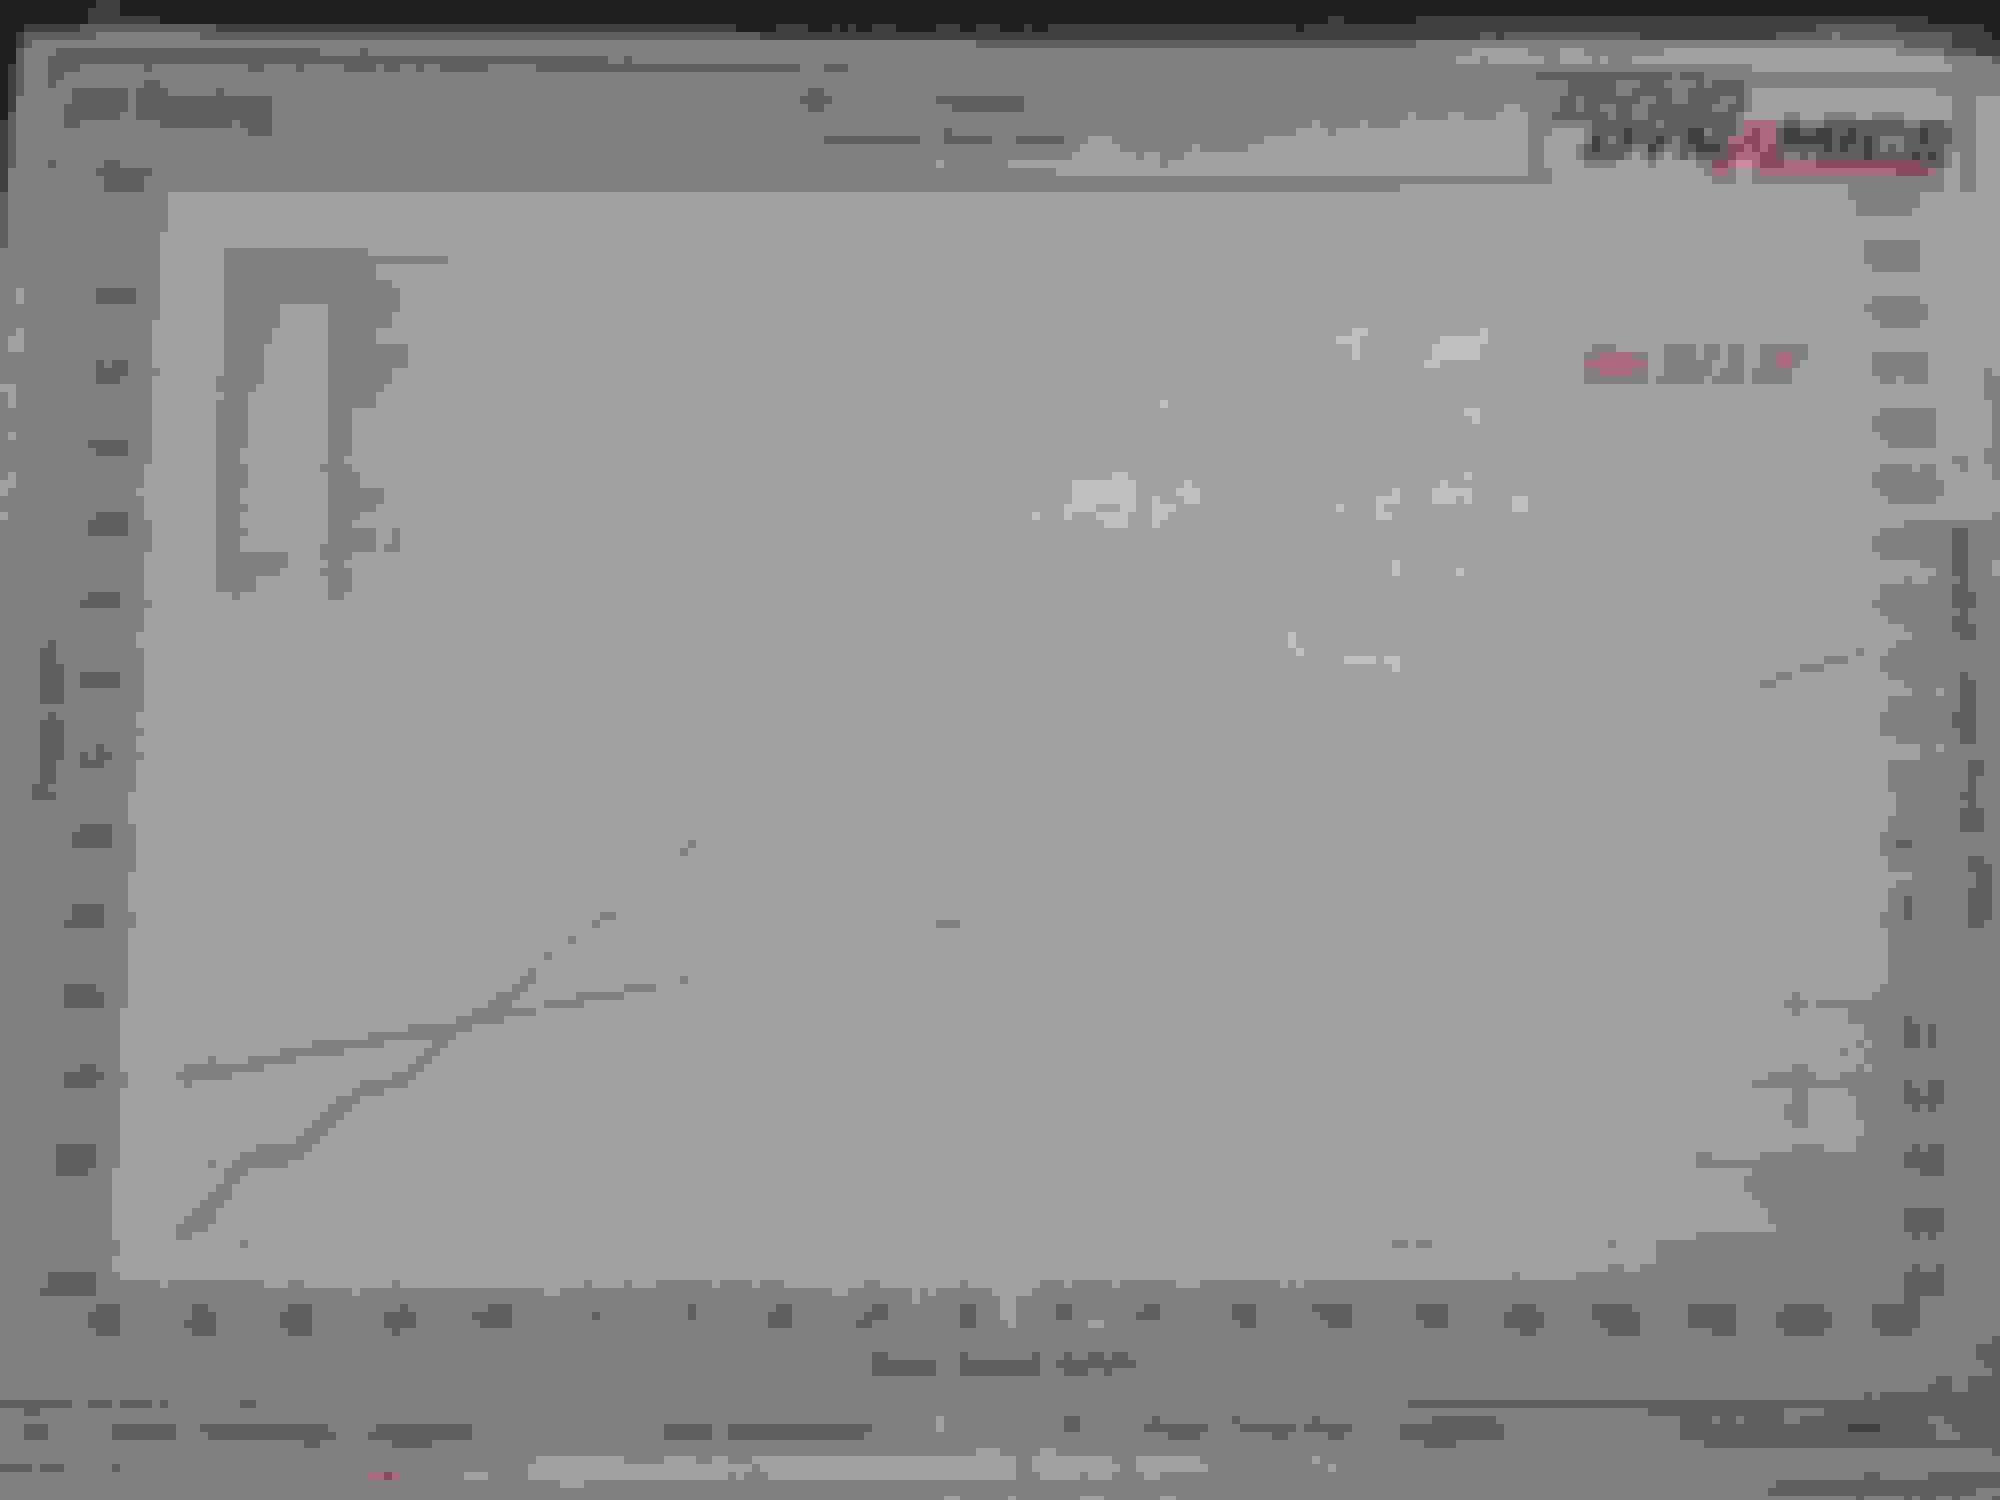 Surging idle problem - LS1TECH - Camaro and Firebird Forum